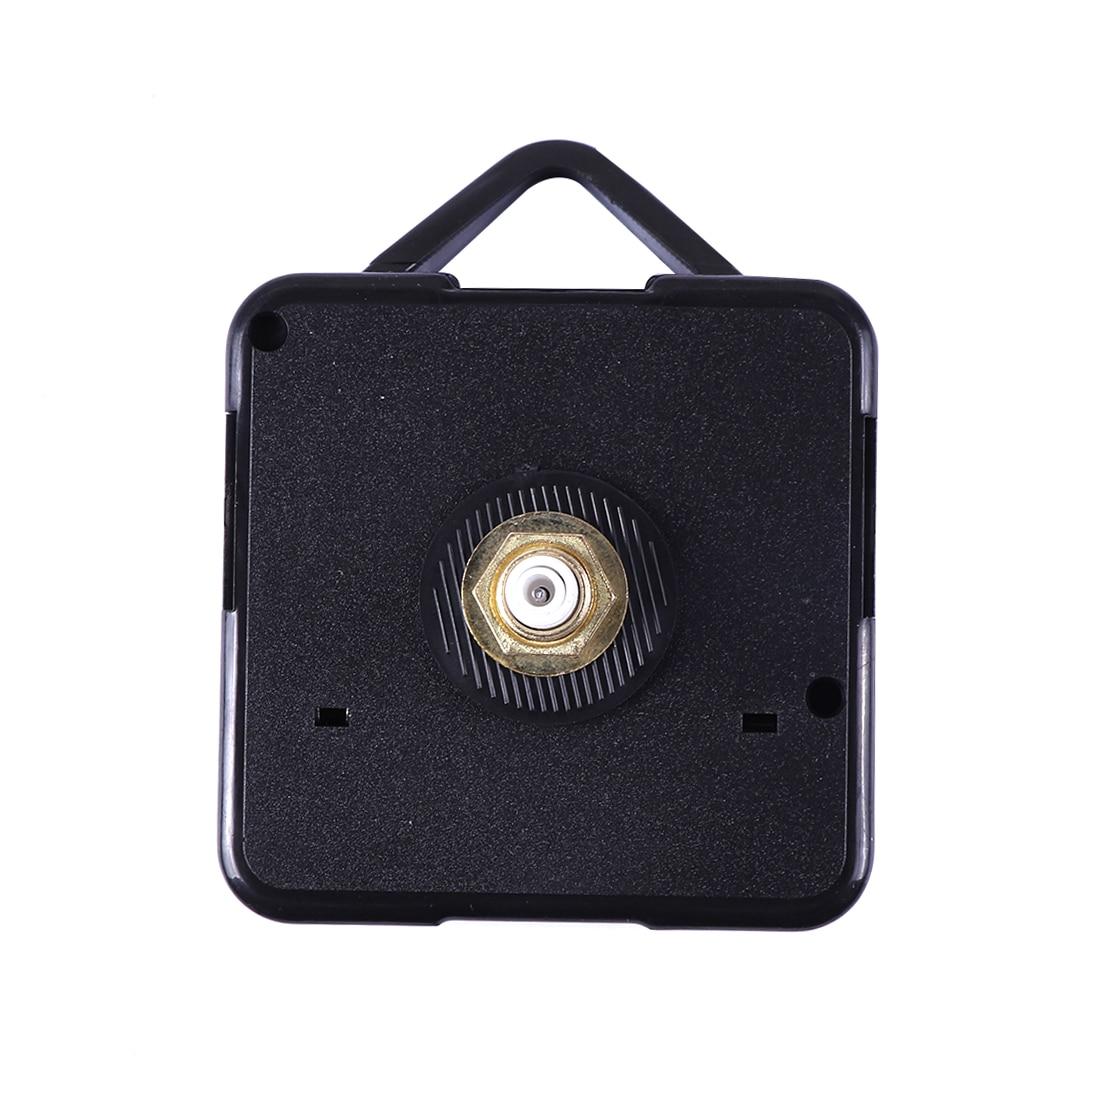 Homingdeco Diy Parts Wall Clock Accessories Set Mute Movement